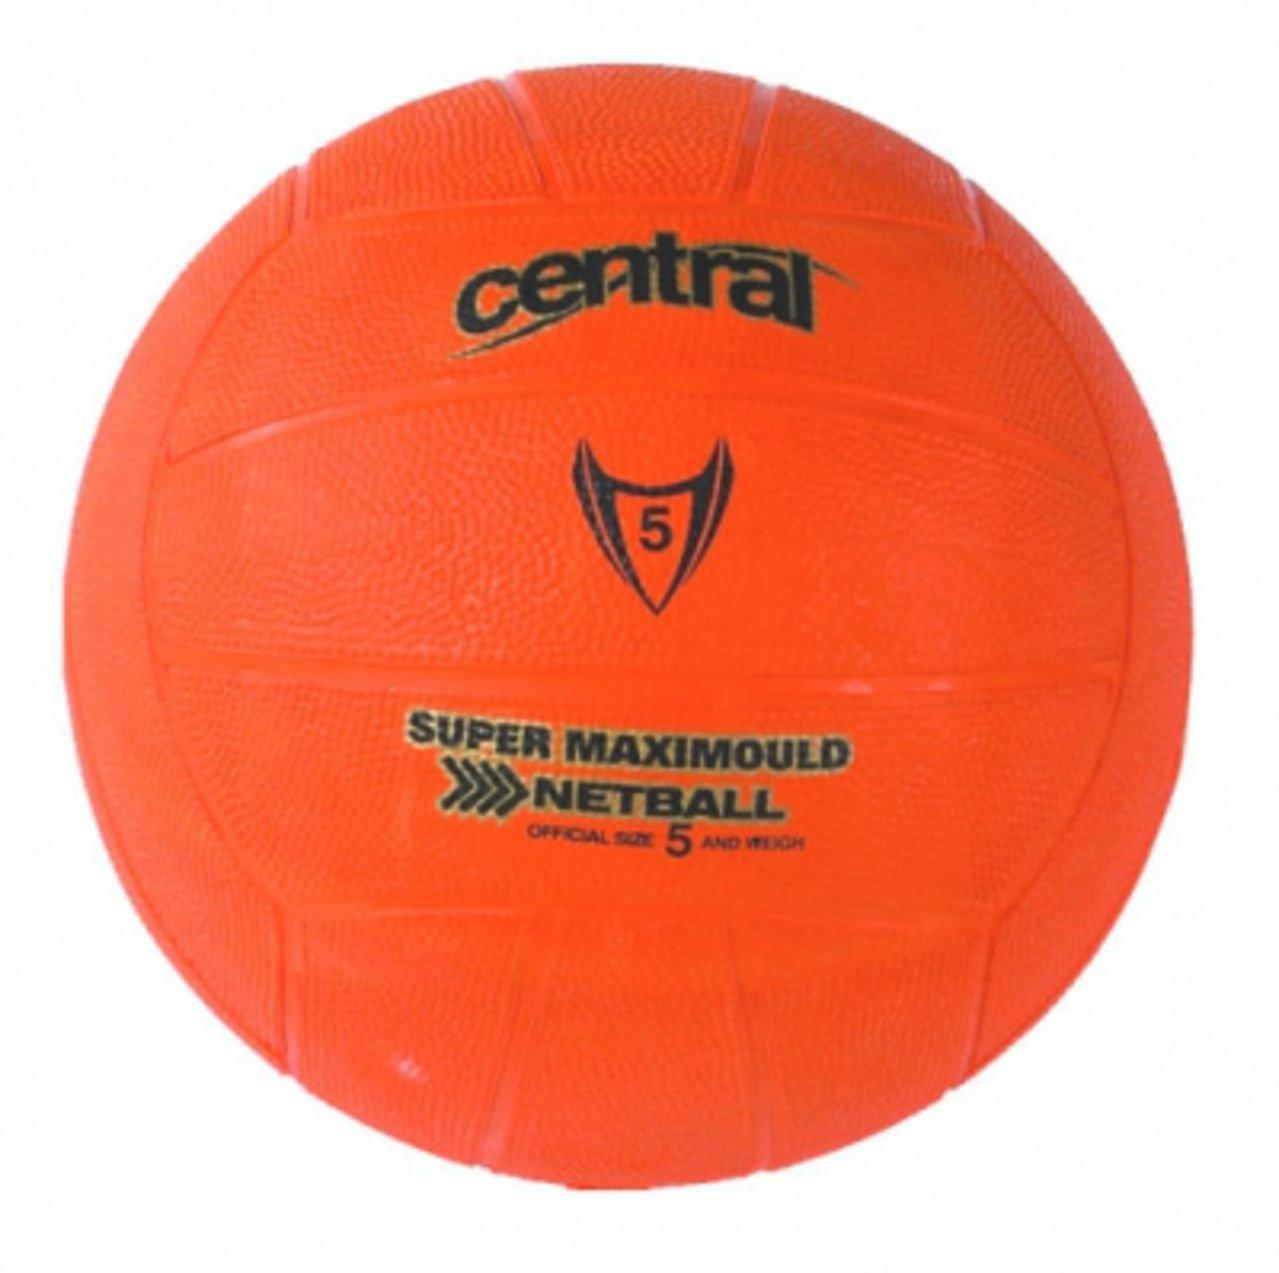 Central School & Club Super Maxi-Mould Rubber Training Netball Orange Sz 3-5